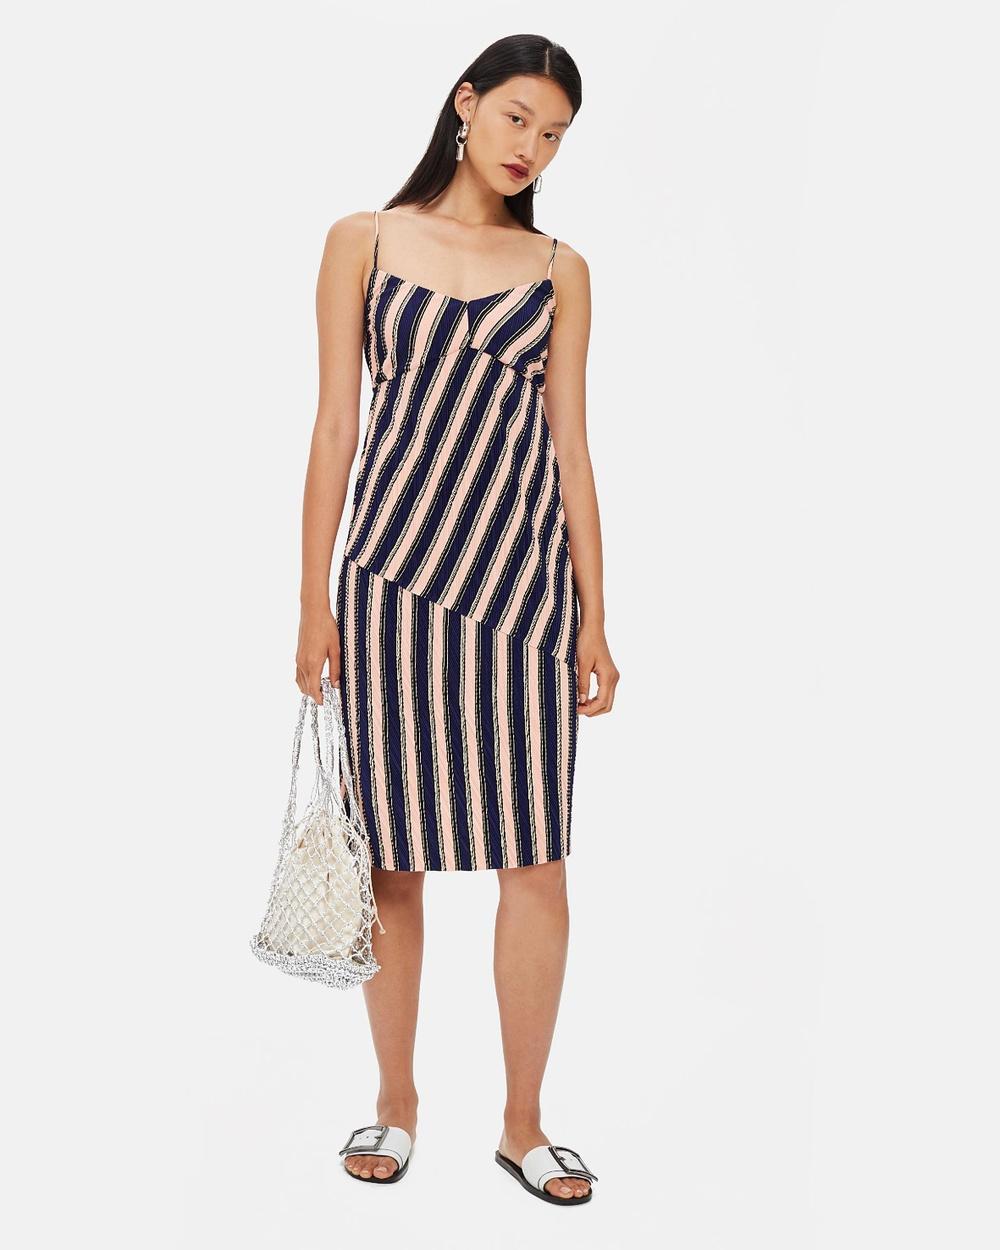 TOPSHOP Mix Stripe Slip Dress Dresses Multi Mix Stripe Slip Dress